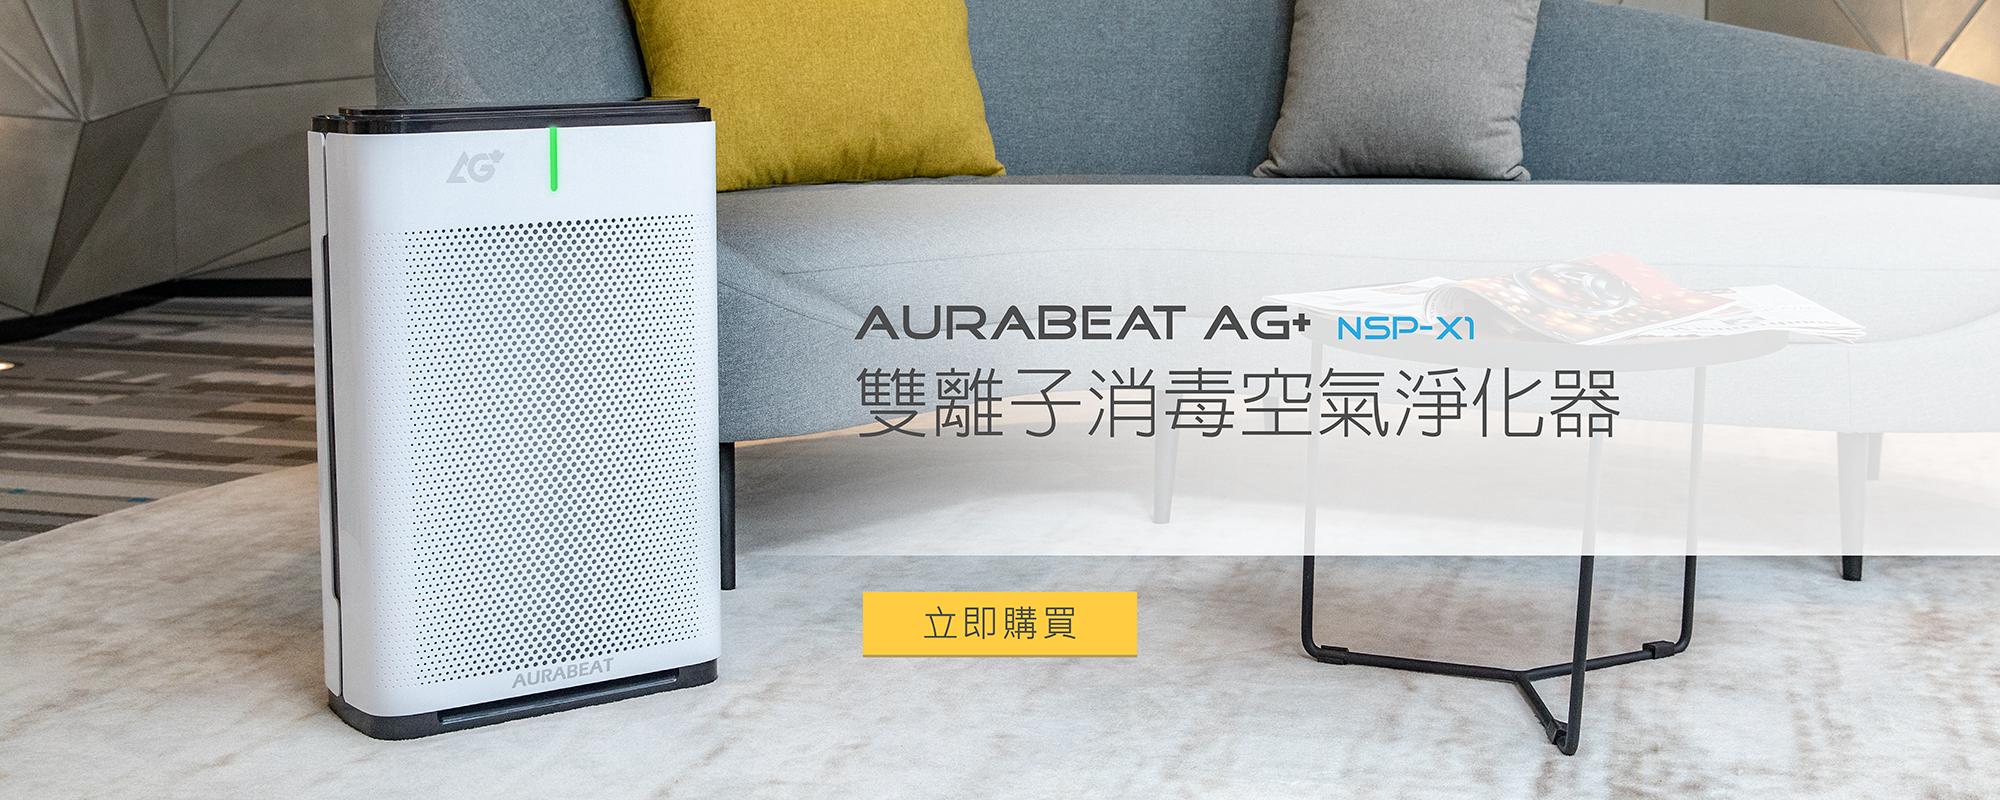 click to buy AURABEAT AG+ Silver Ion Plasma Sterilization Air Purifier